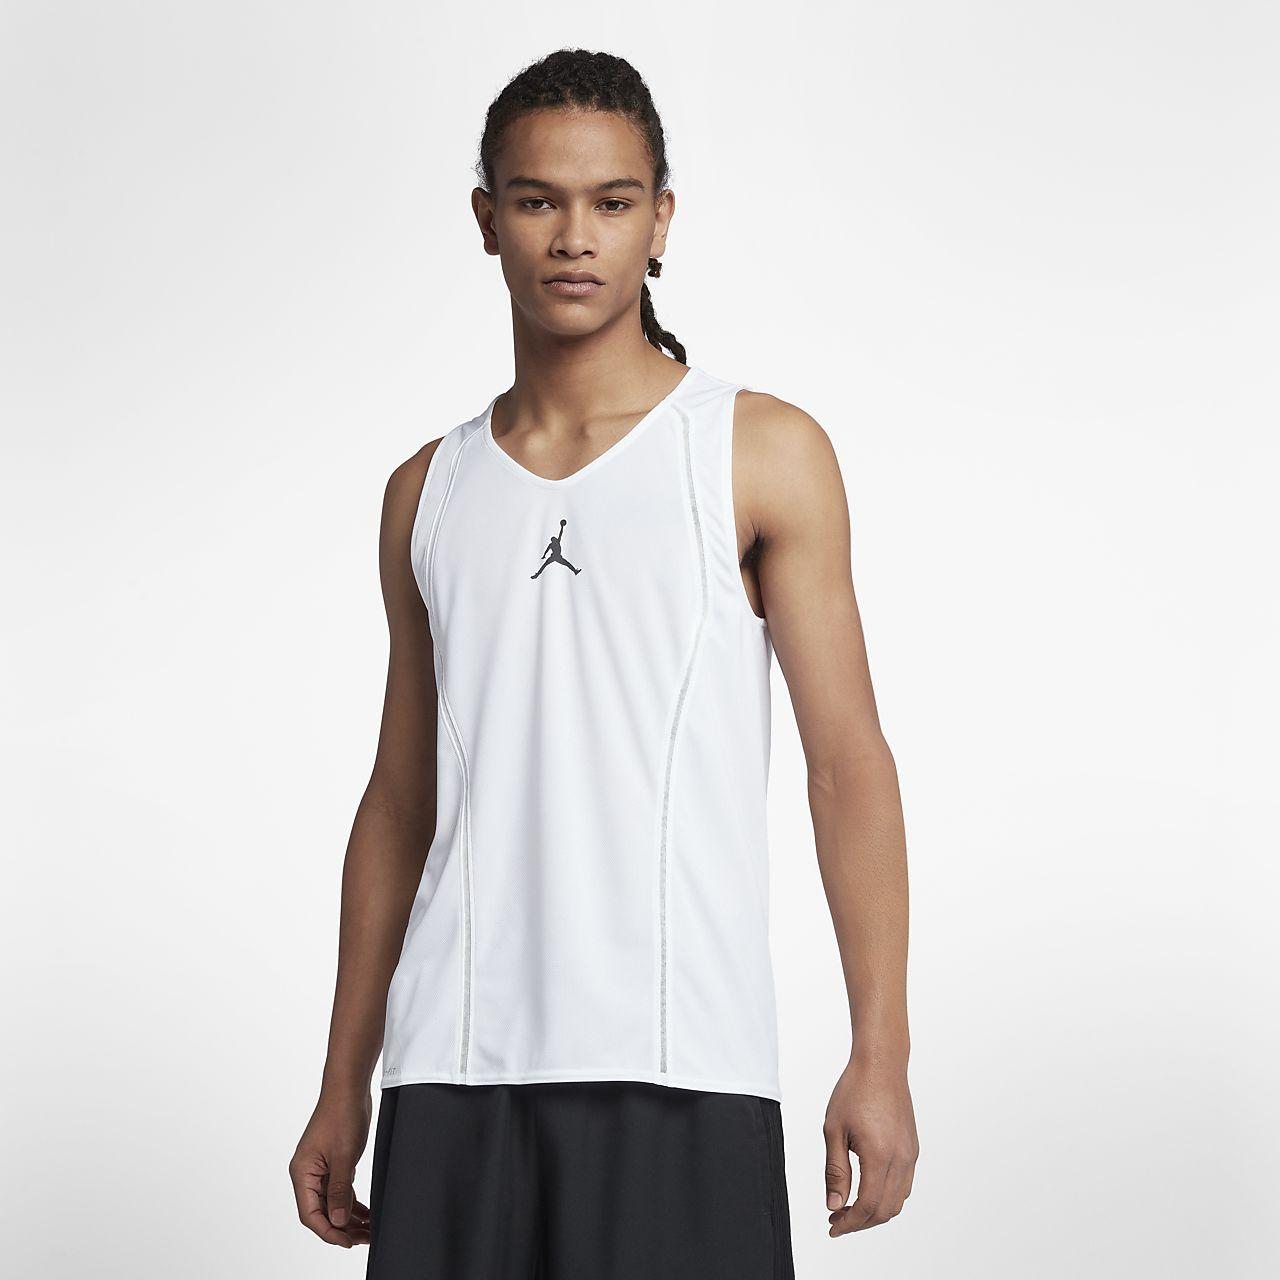 Camiseta de básquetbol para hombre Jordan Ultimate Flight